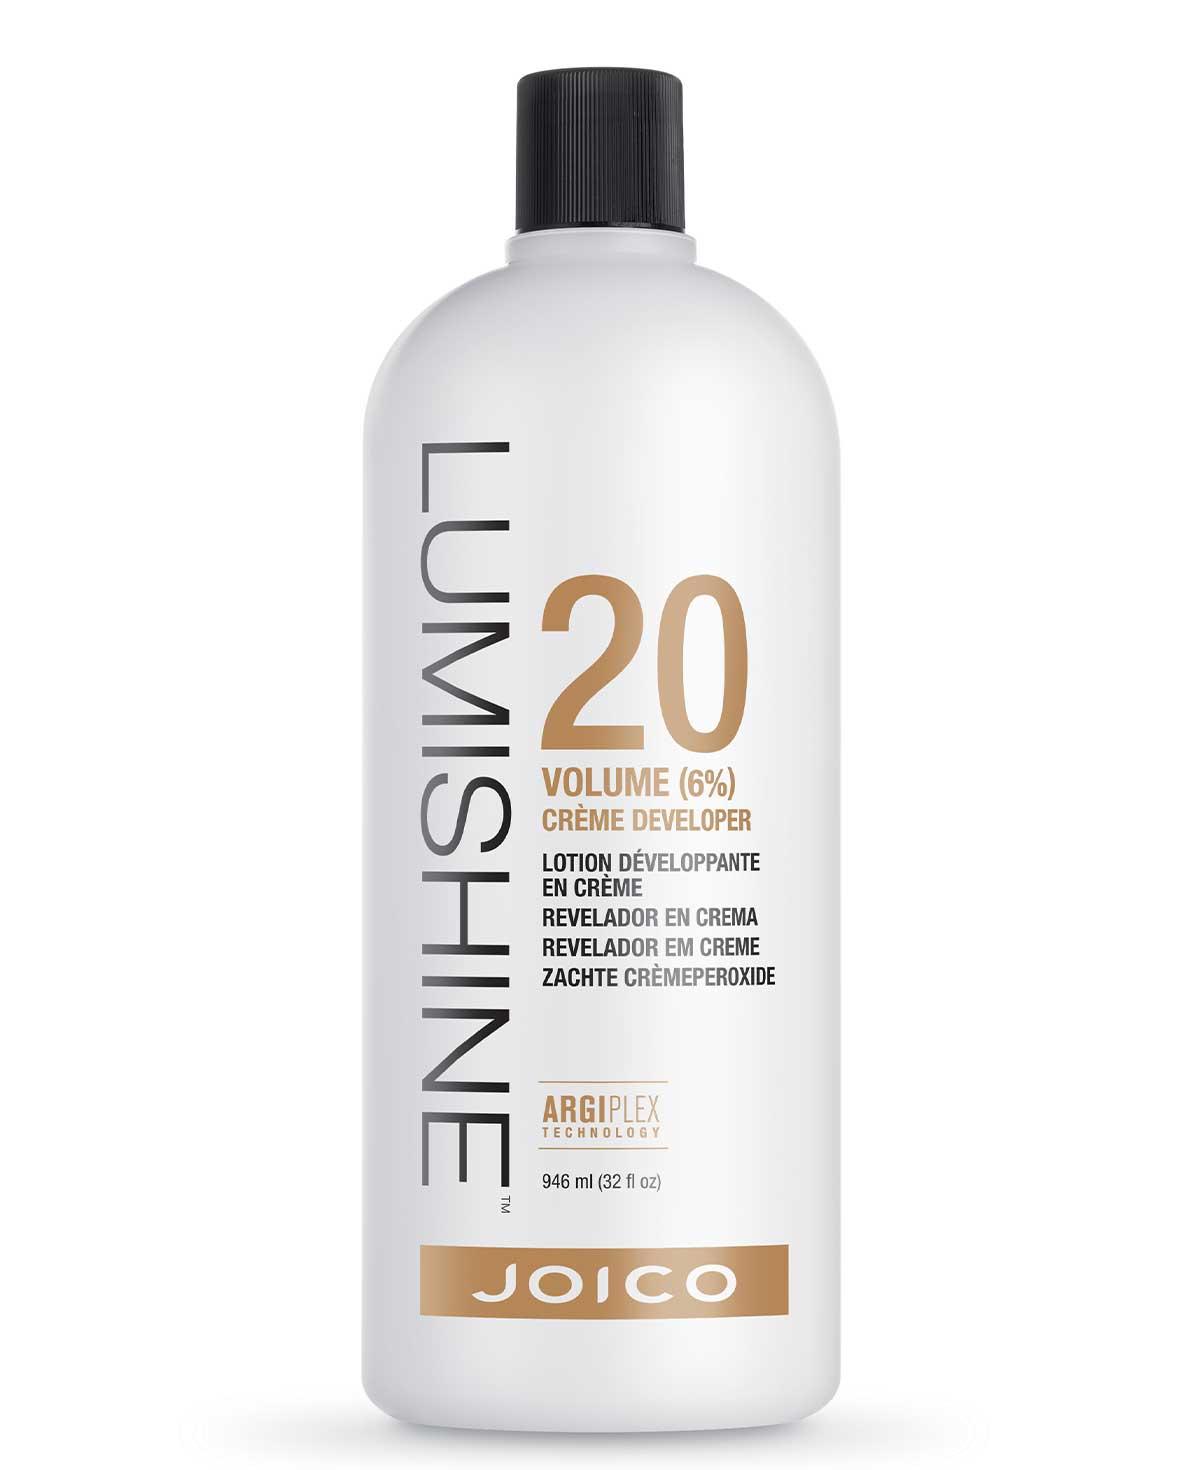 Joico Lumishine 20 Volume (6%) Creme Developer 950ml